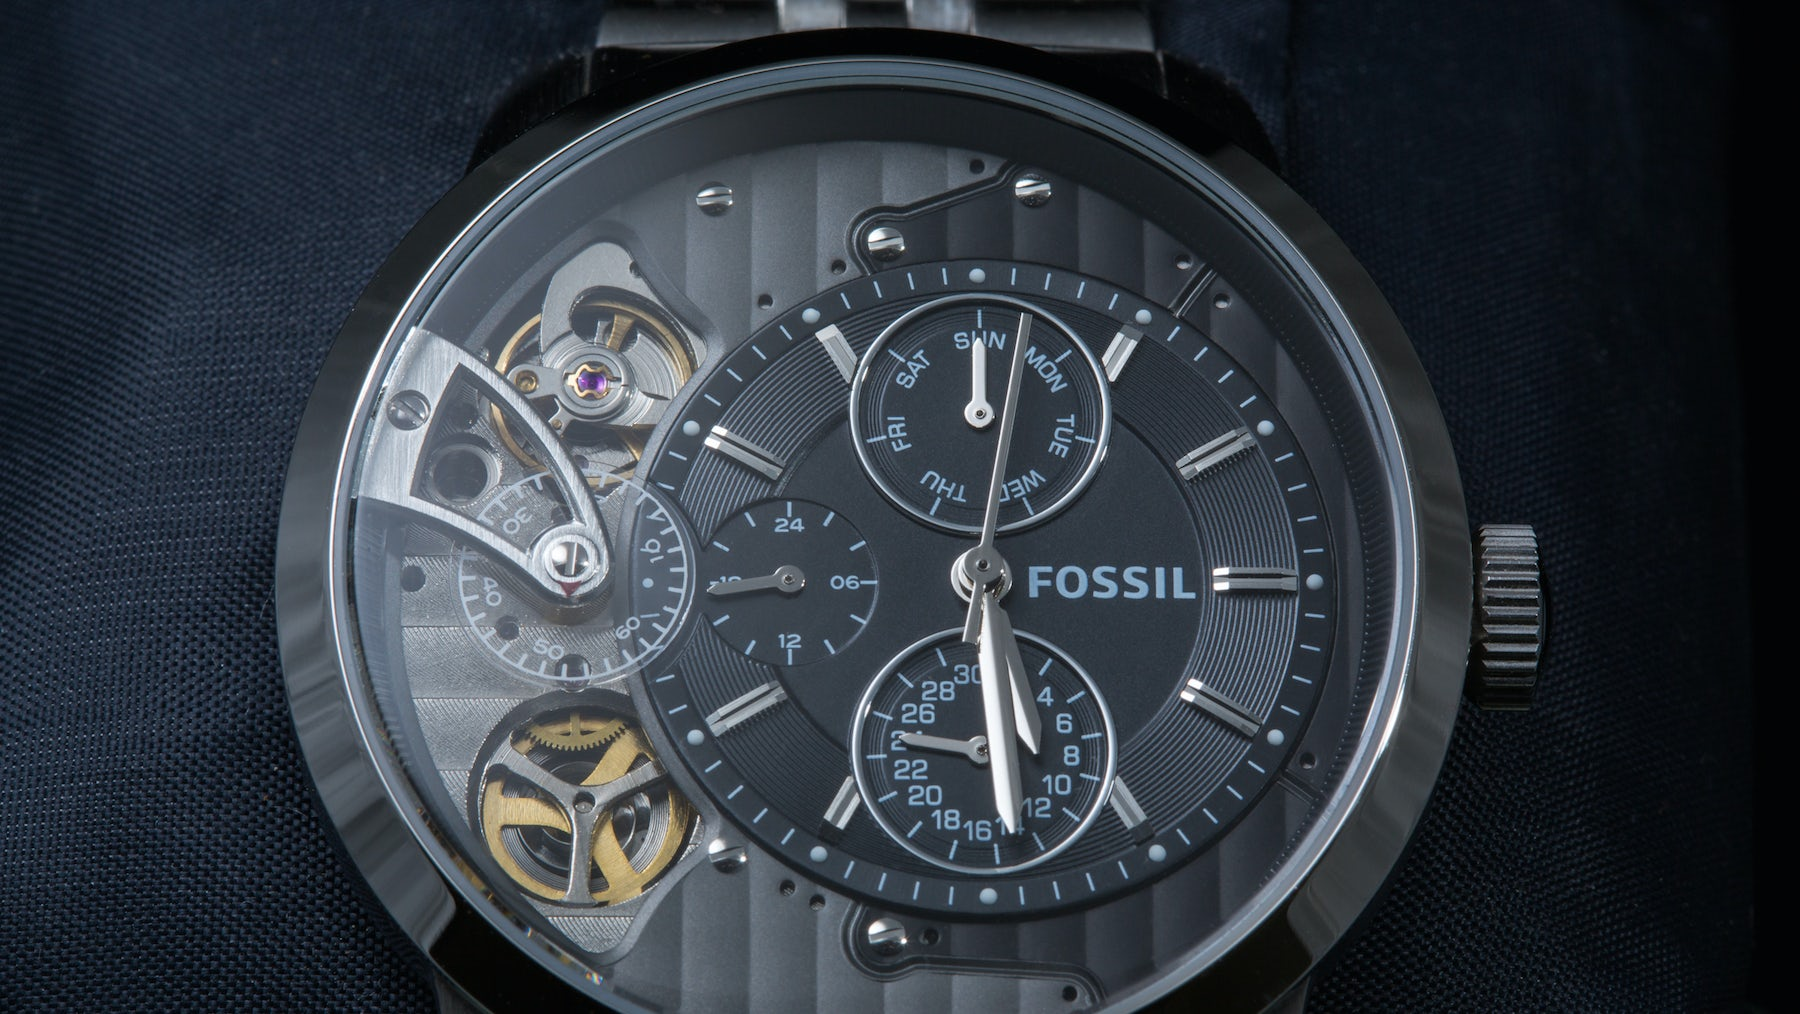 Fossil Watch | Source: Flickr/ErickHouli